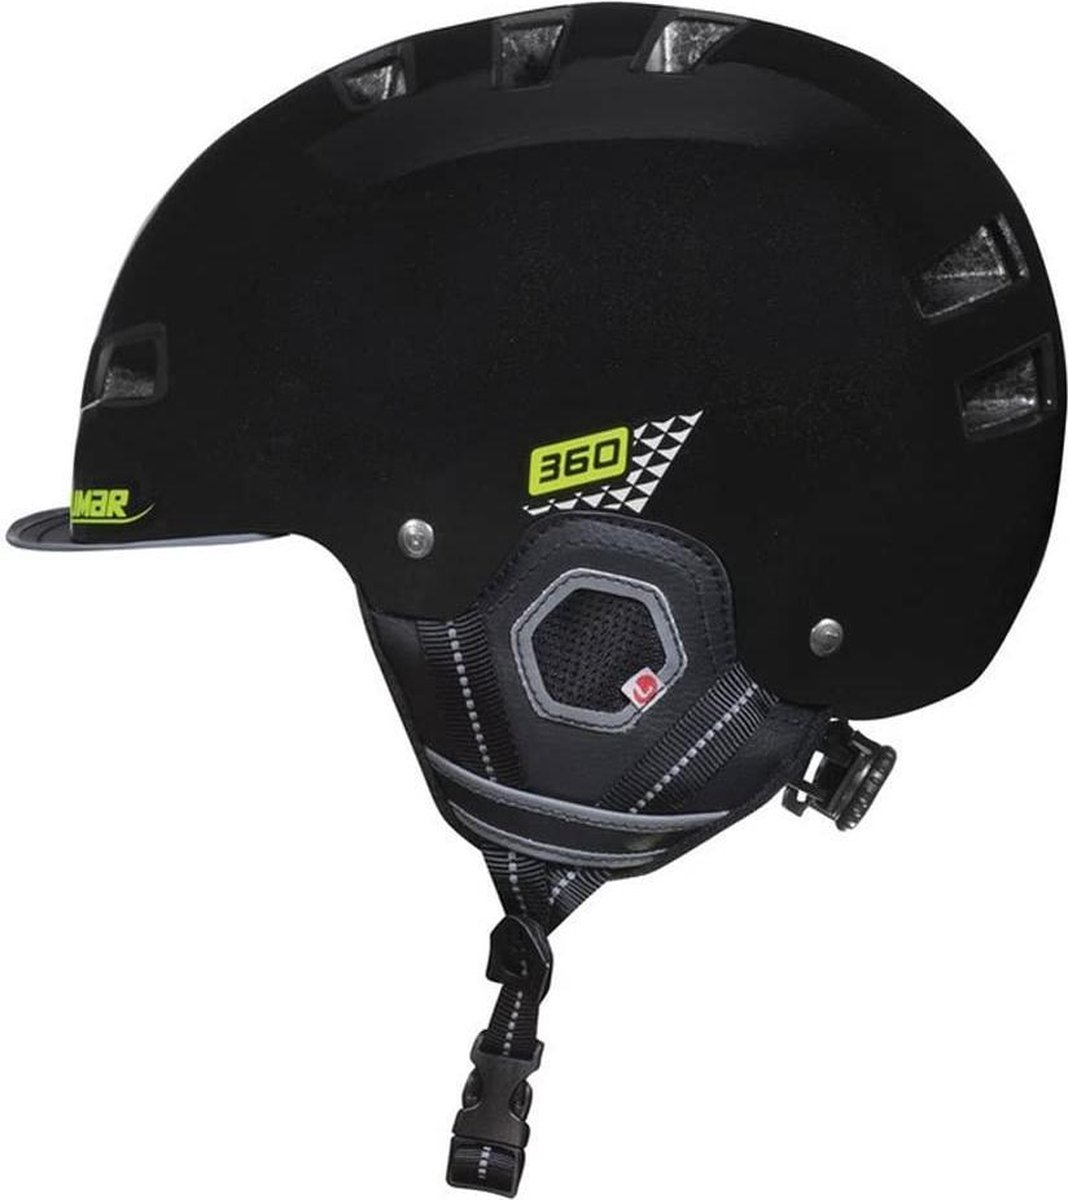 Limar Fietshelm 360 Urban/Skate 57-62cm Reflective black